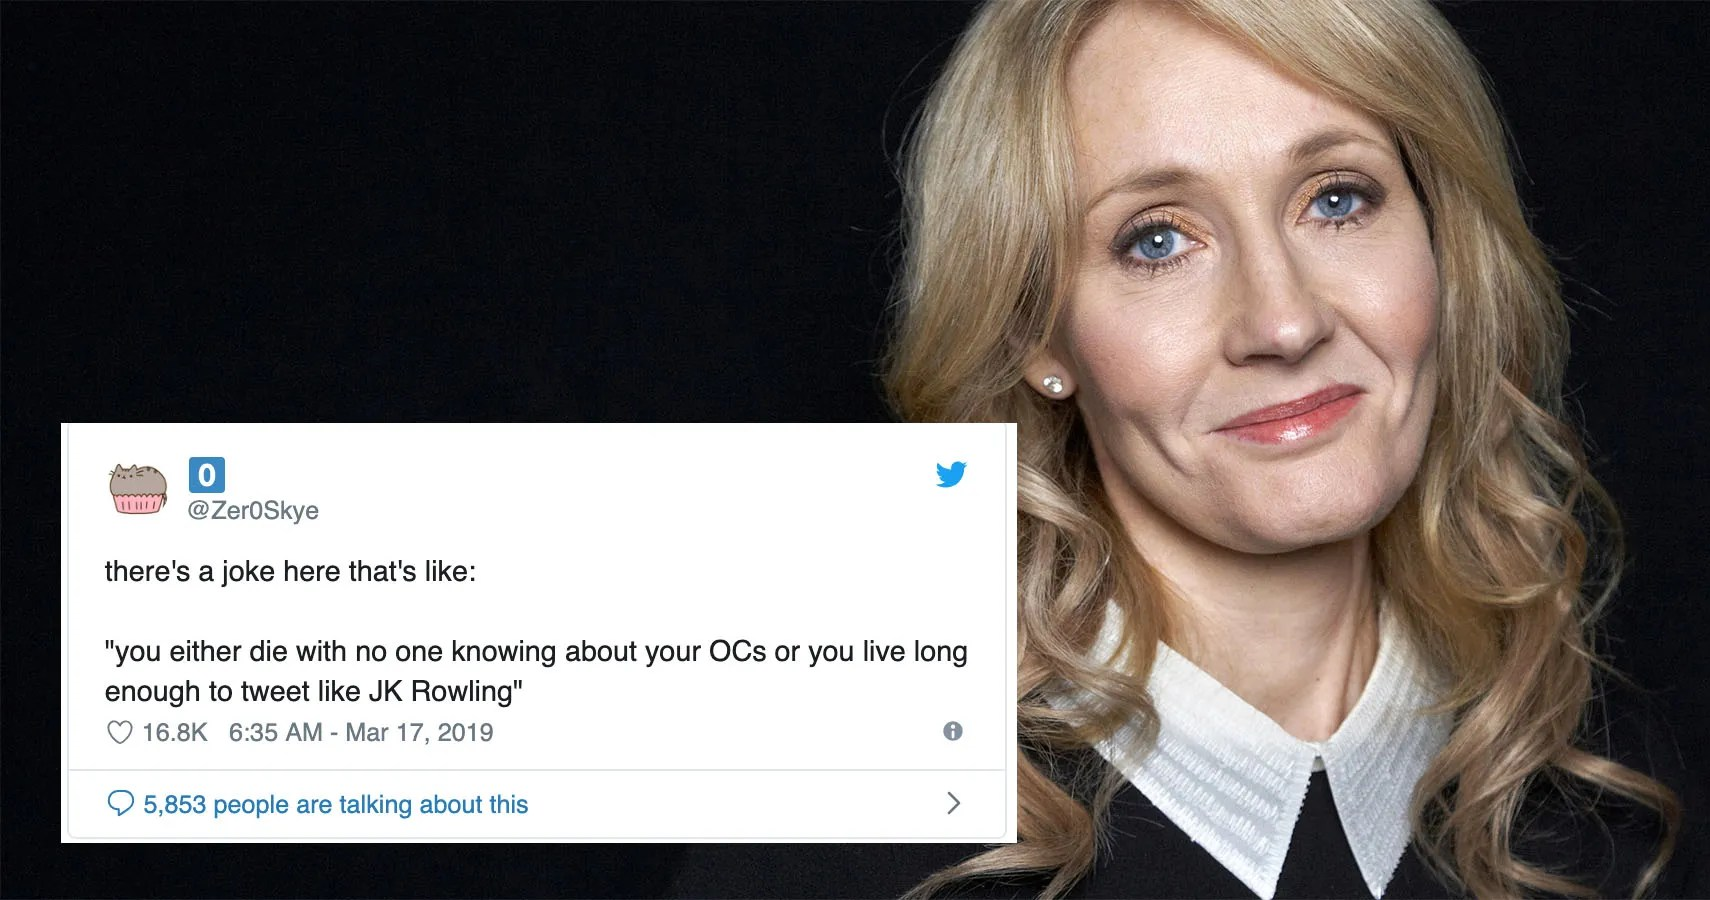 J K Rowling Has Transcended Into A Living Meme